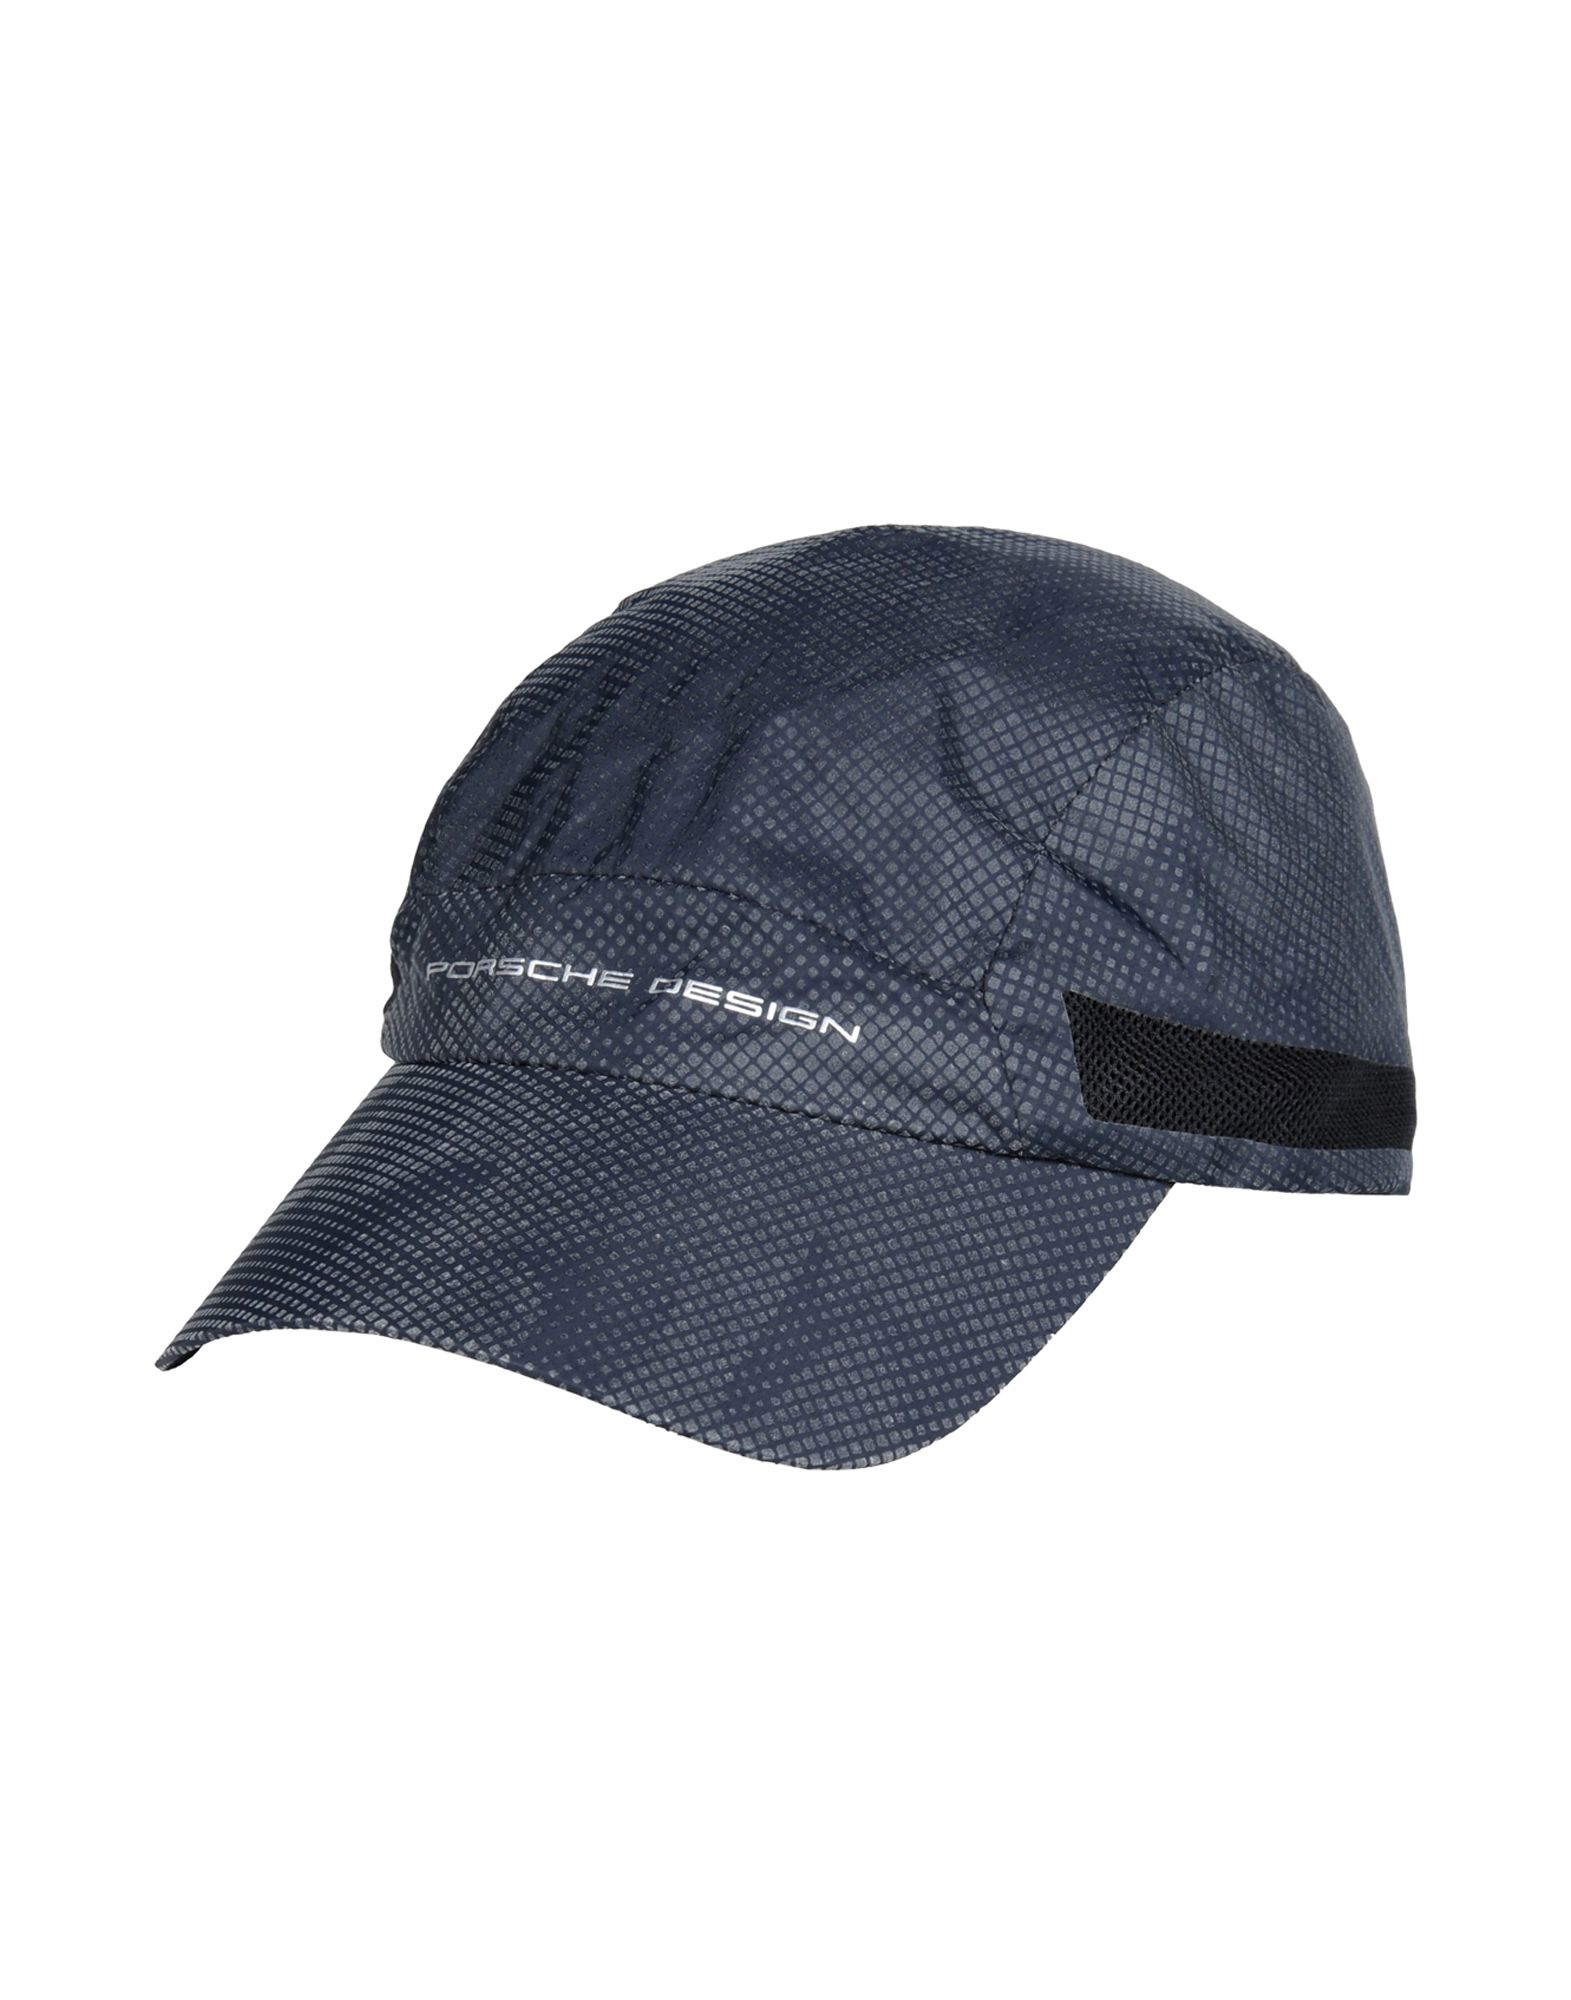 the best attitude 18d54 c5b55 Lyst - Porsche Design Hat in Gray for Men